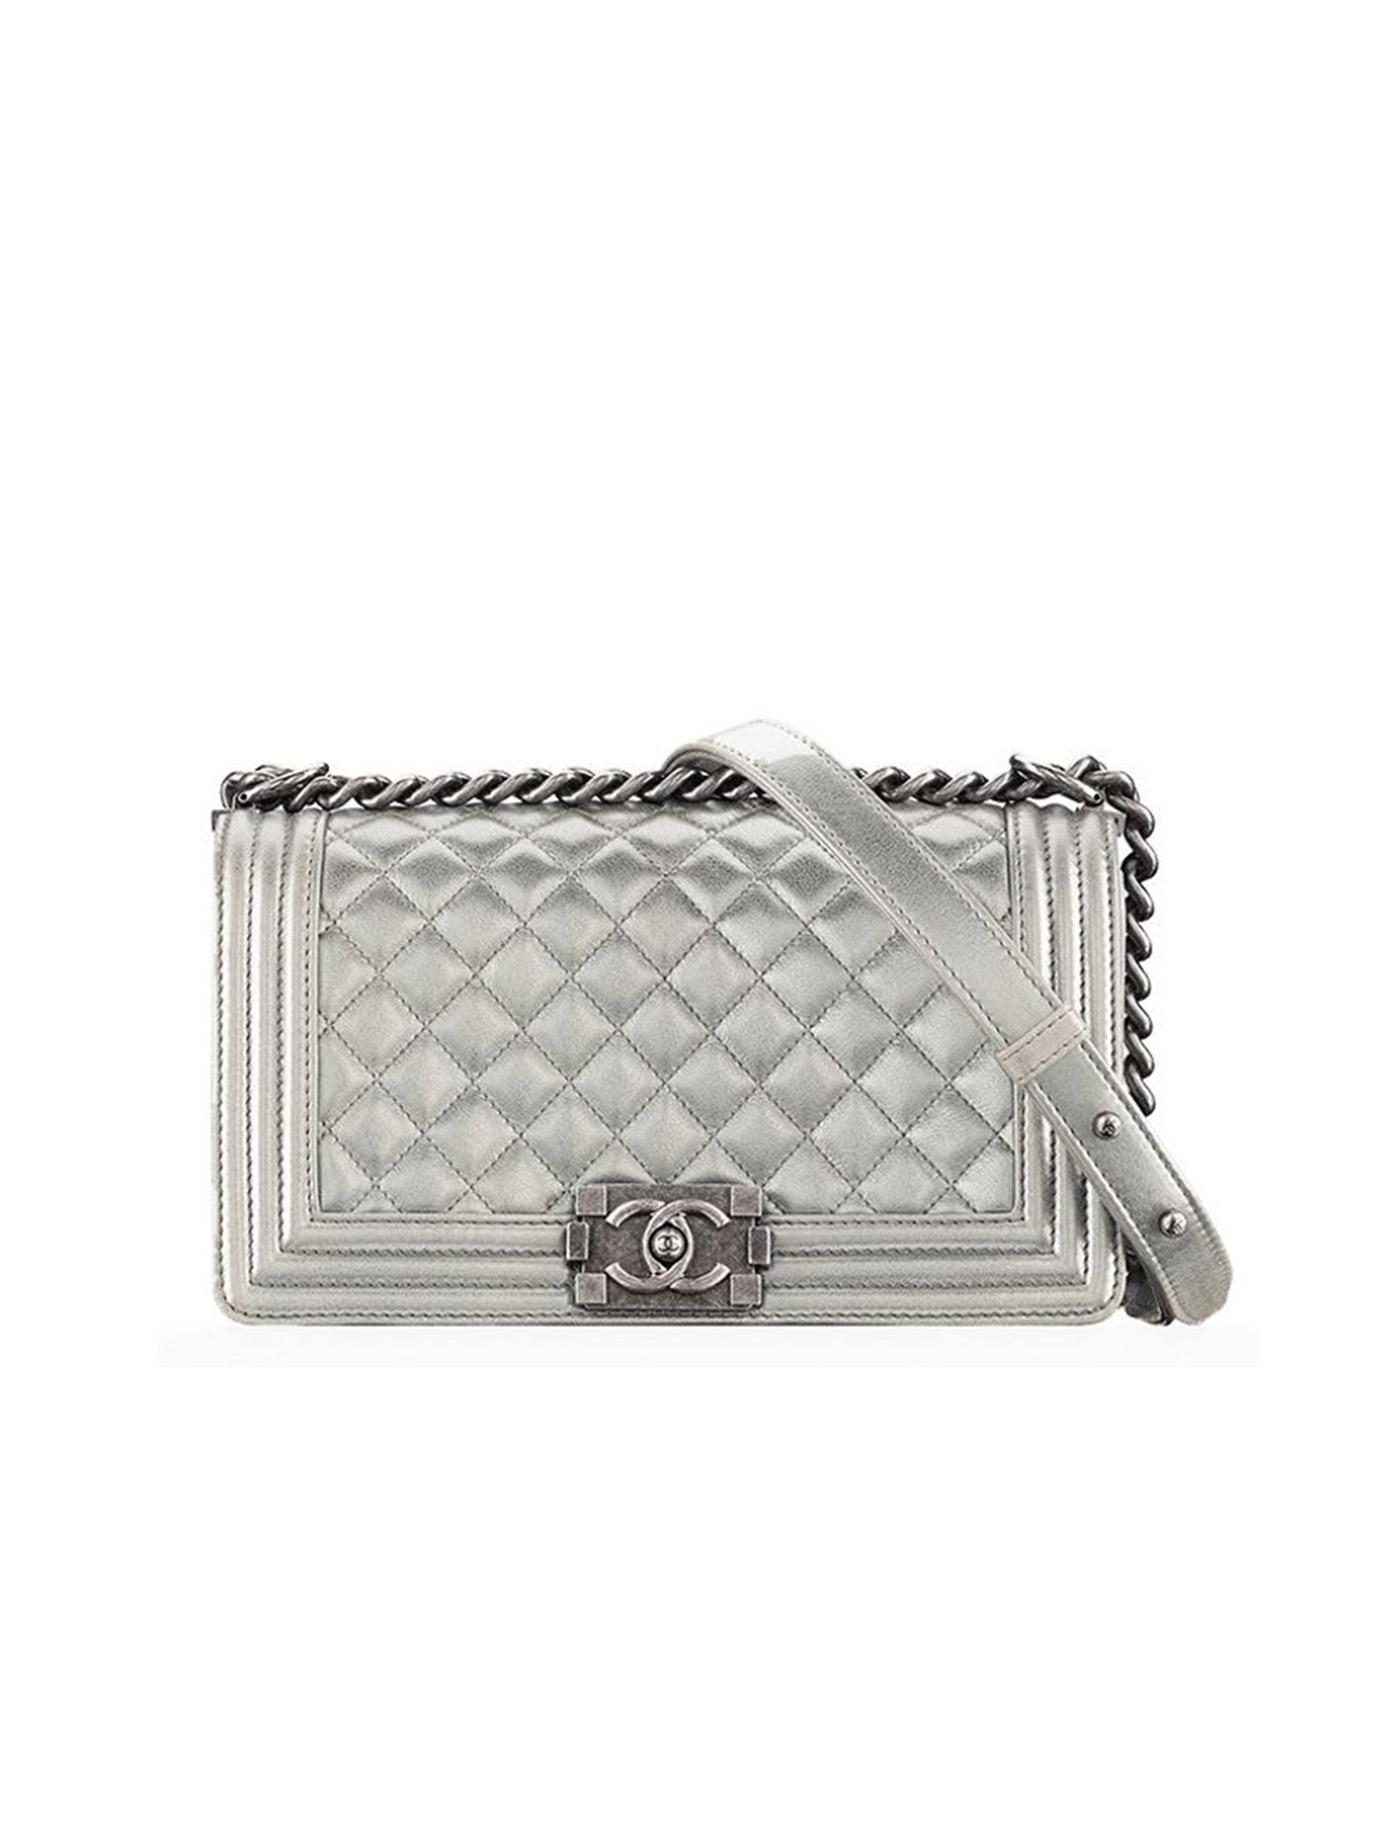 CHANEL   Metallic Silver Leather Purse  Borrow $250 / Retail $5,400